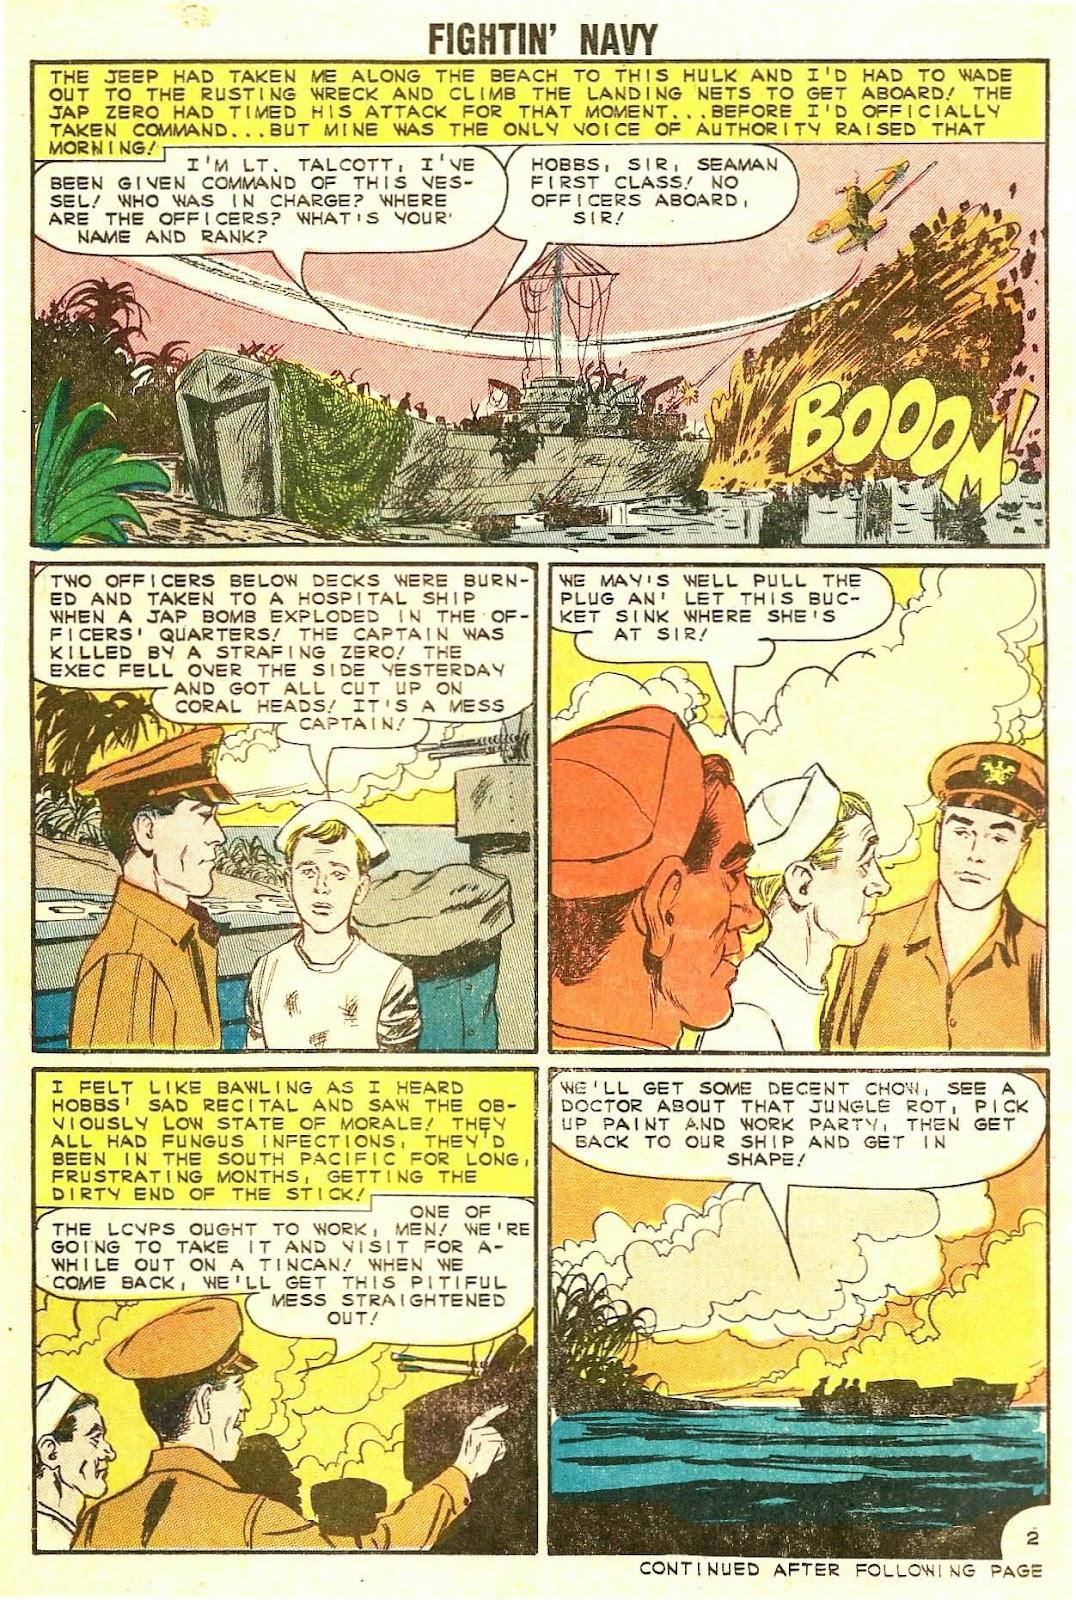 Read online Fightin' Navy comic -  Issue #114 - 14